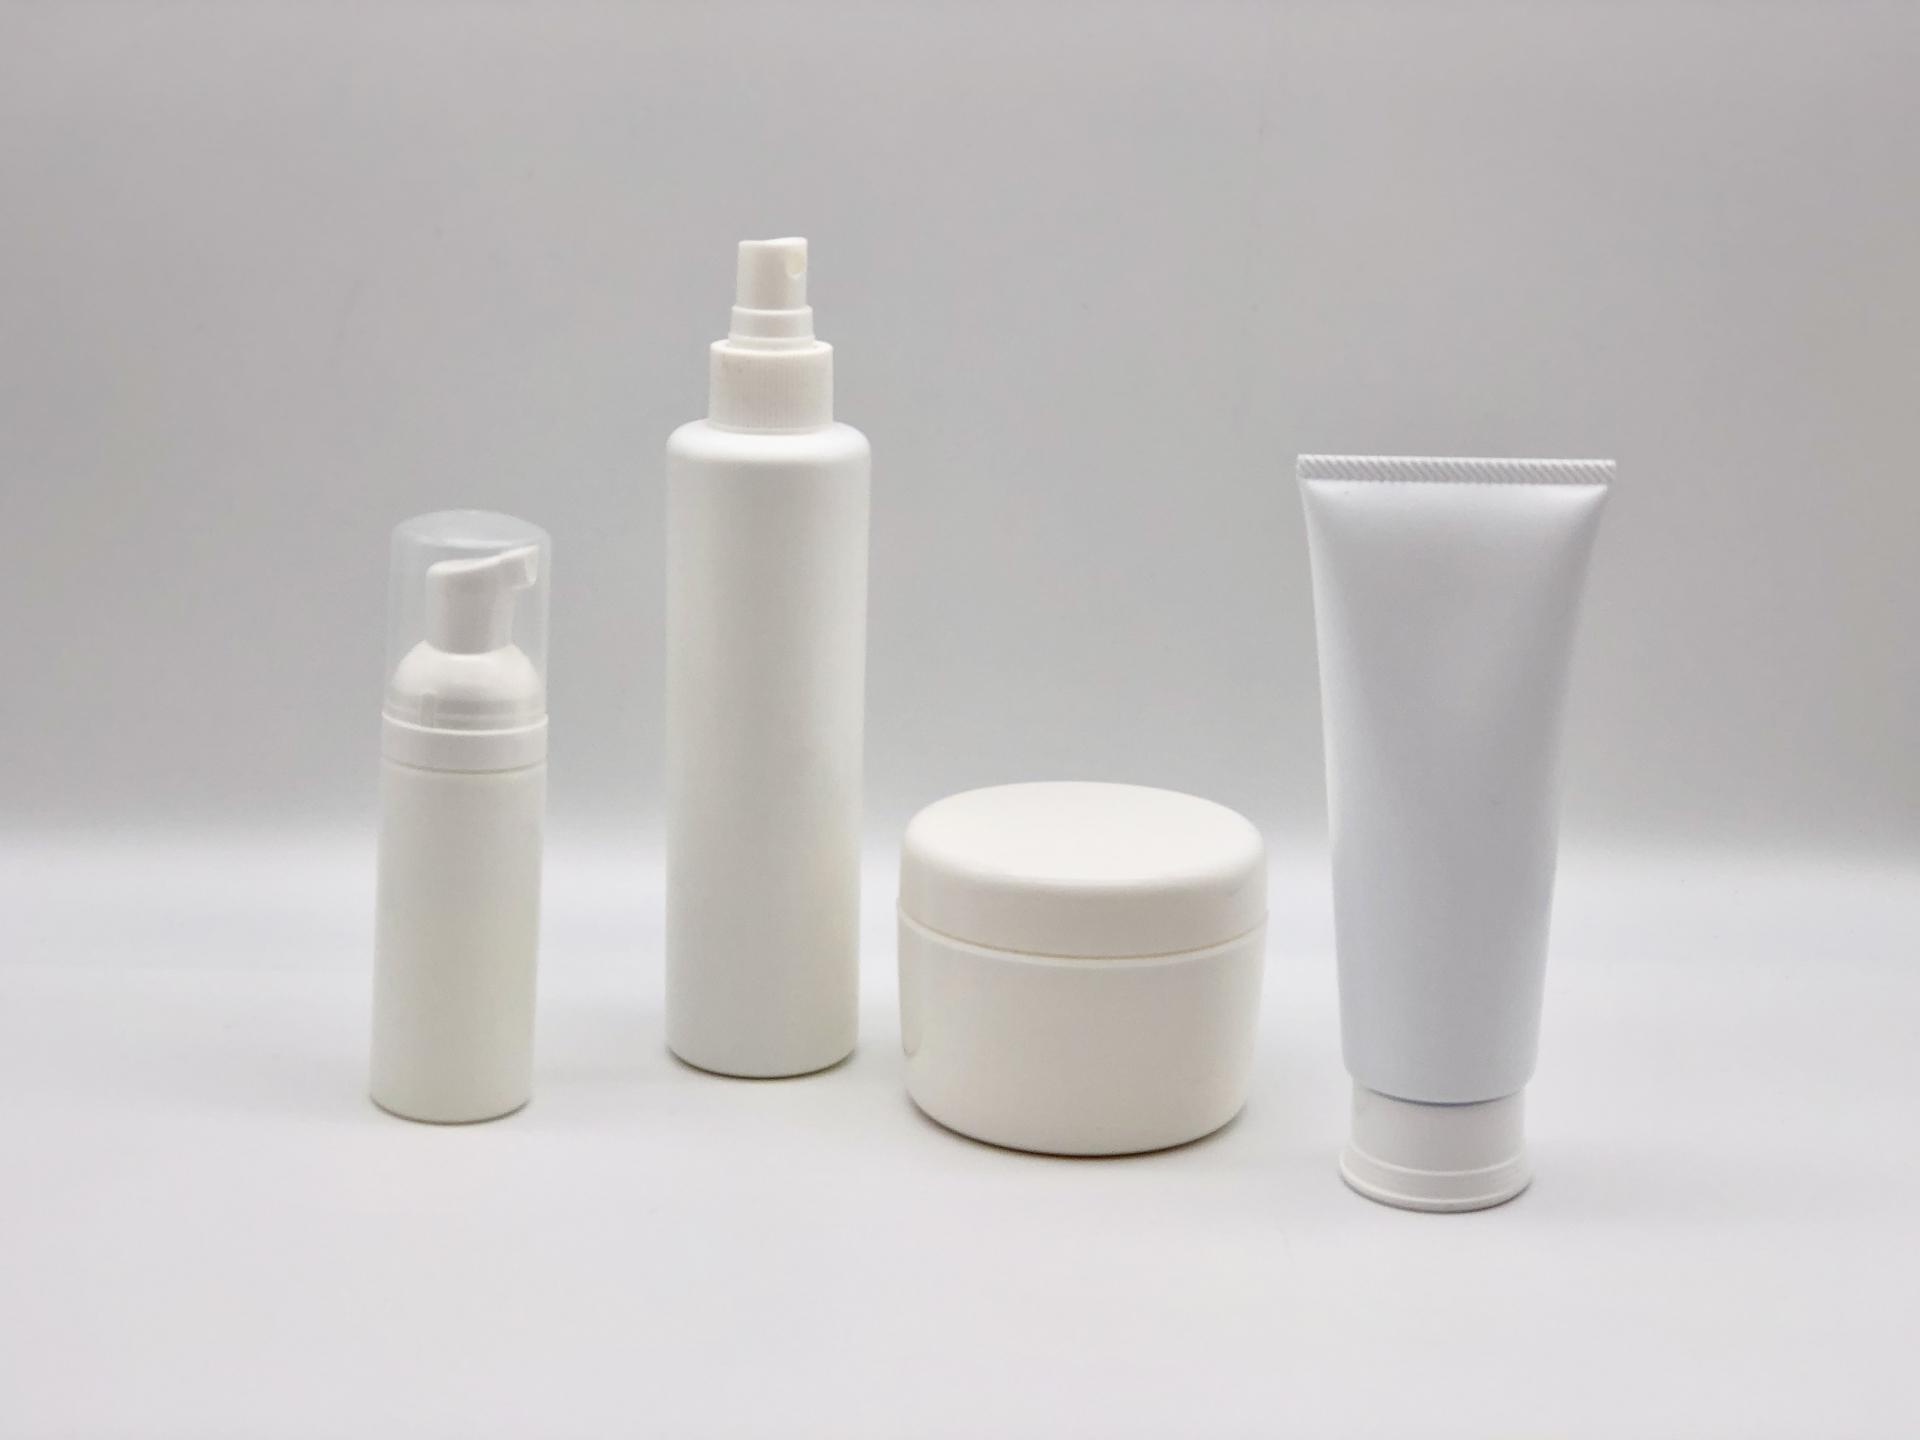 cosmetica11__化粧品11